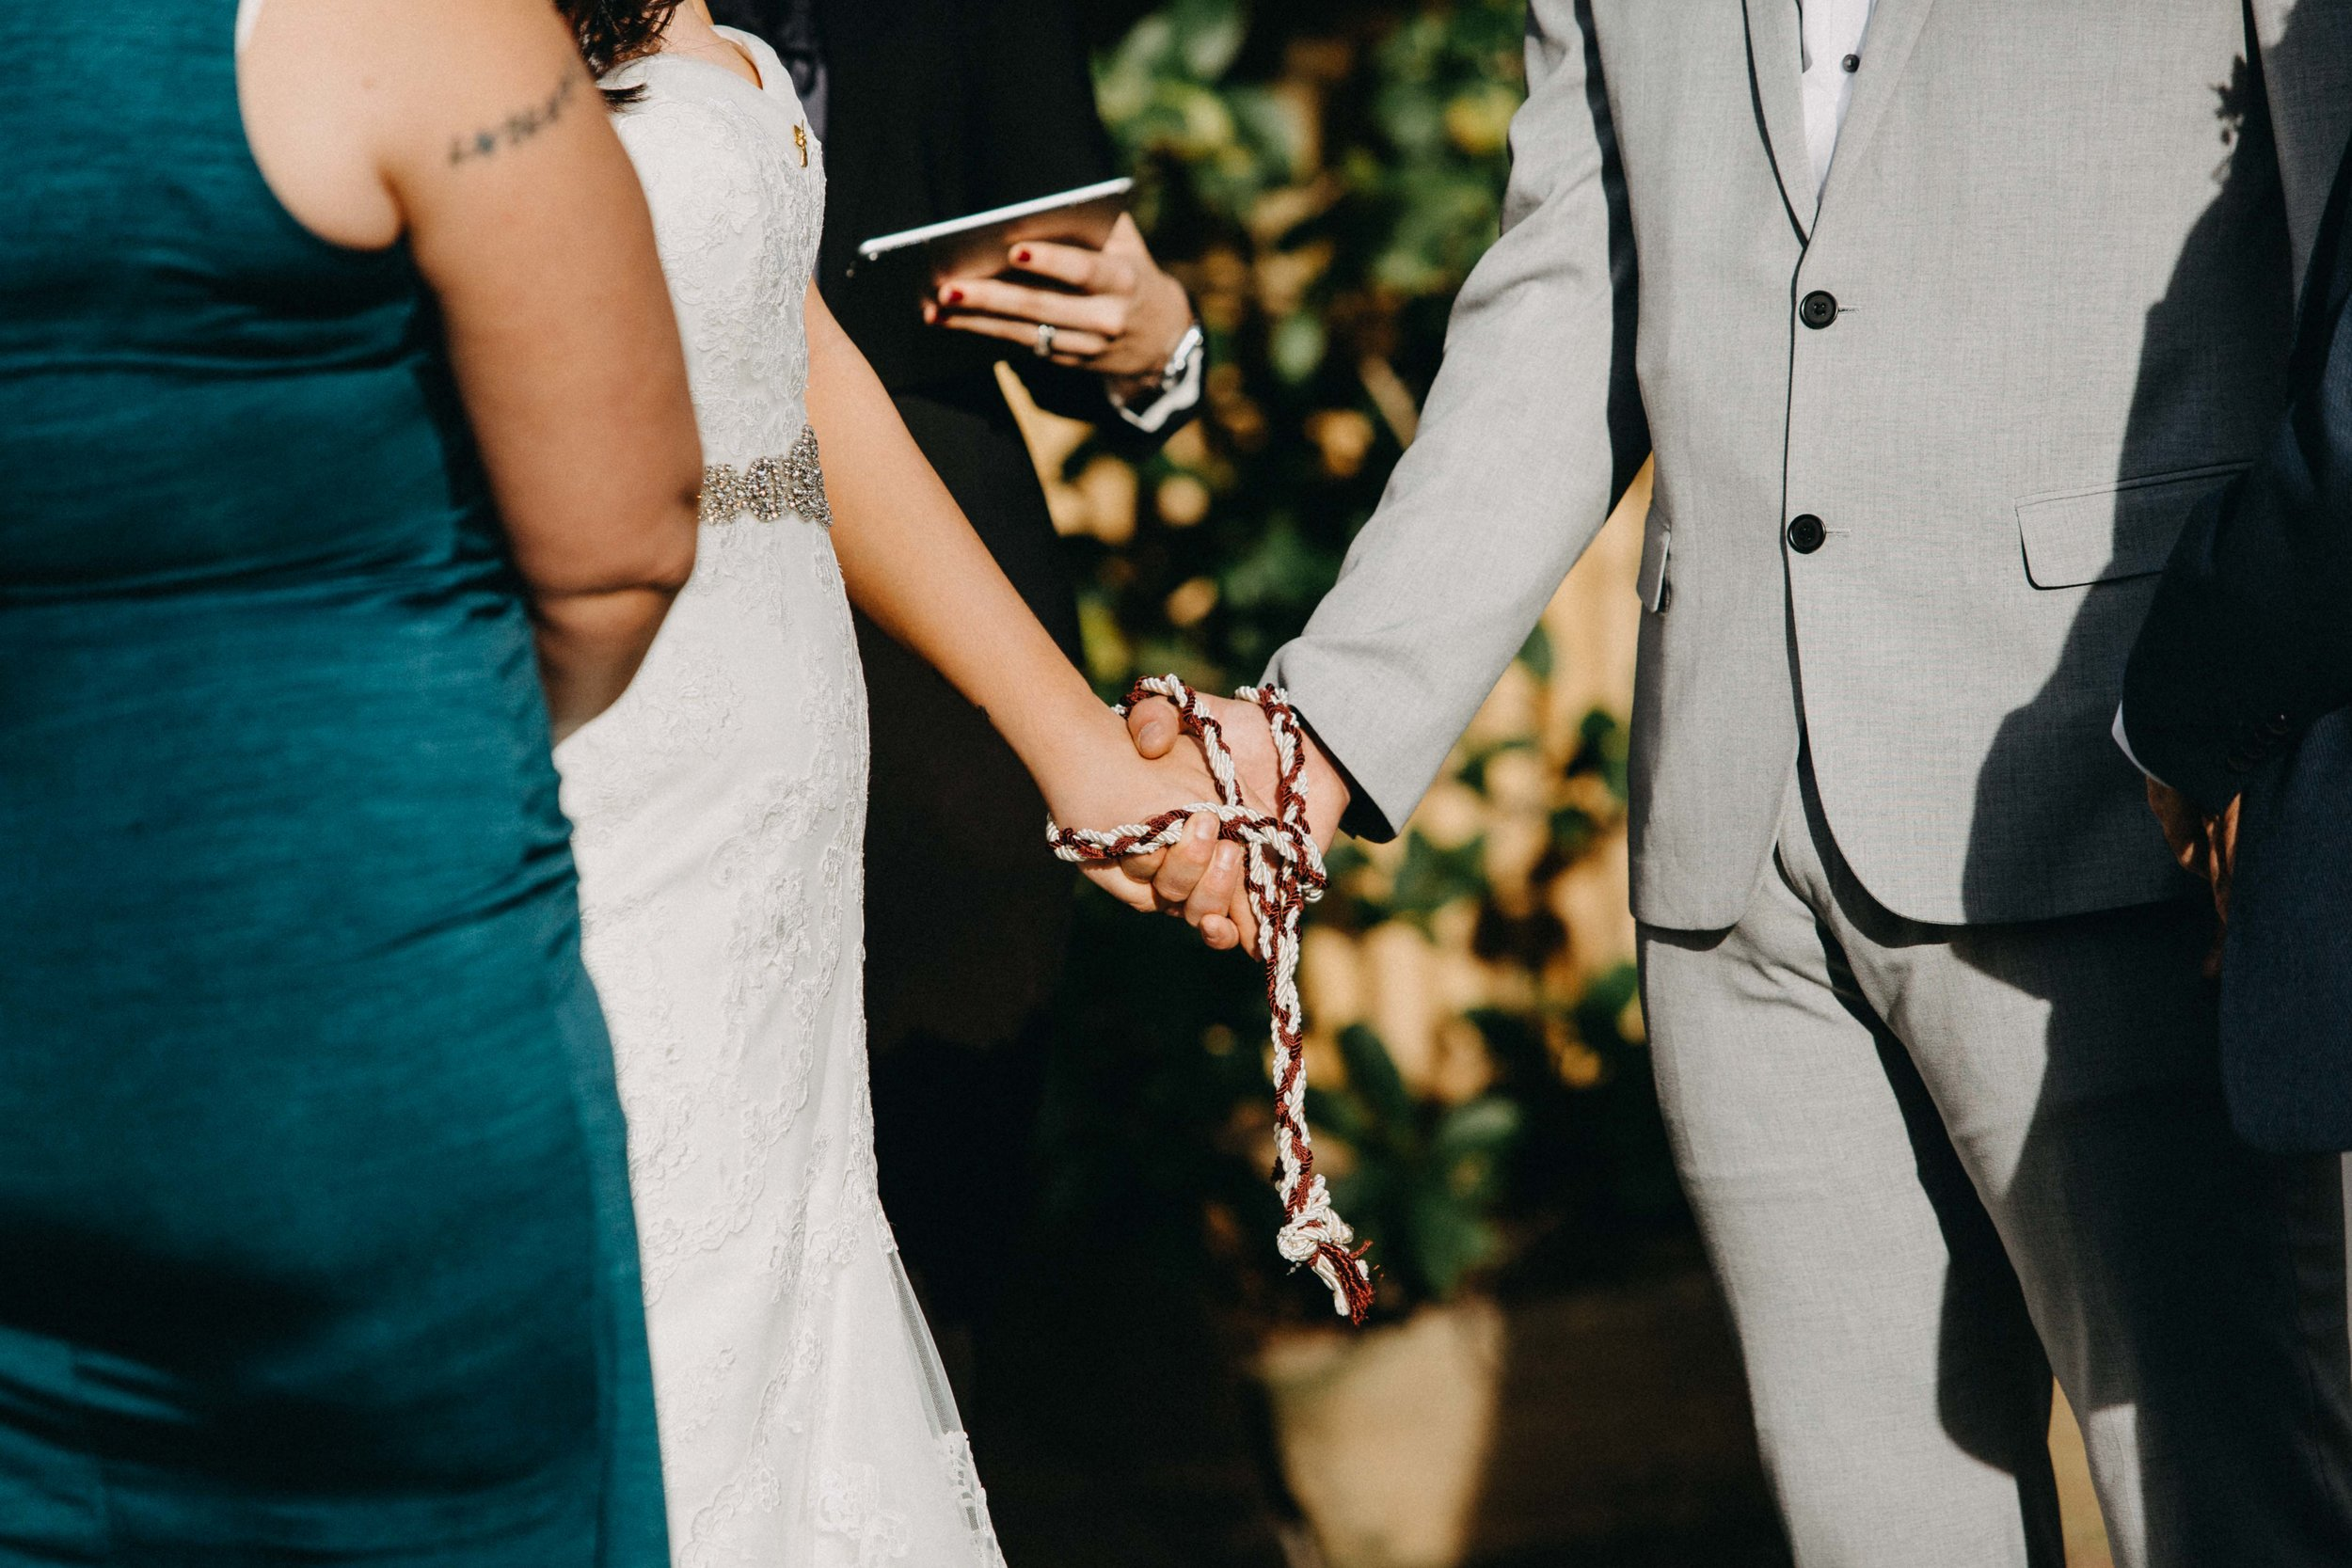 burnham-grove-camden-wedding-emilyobrienphotography-macarthur-69.jpg